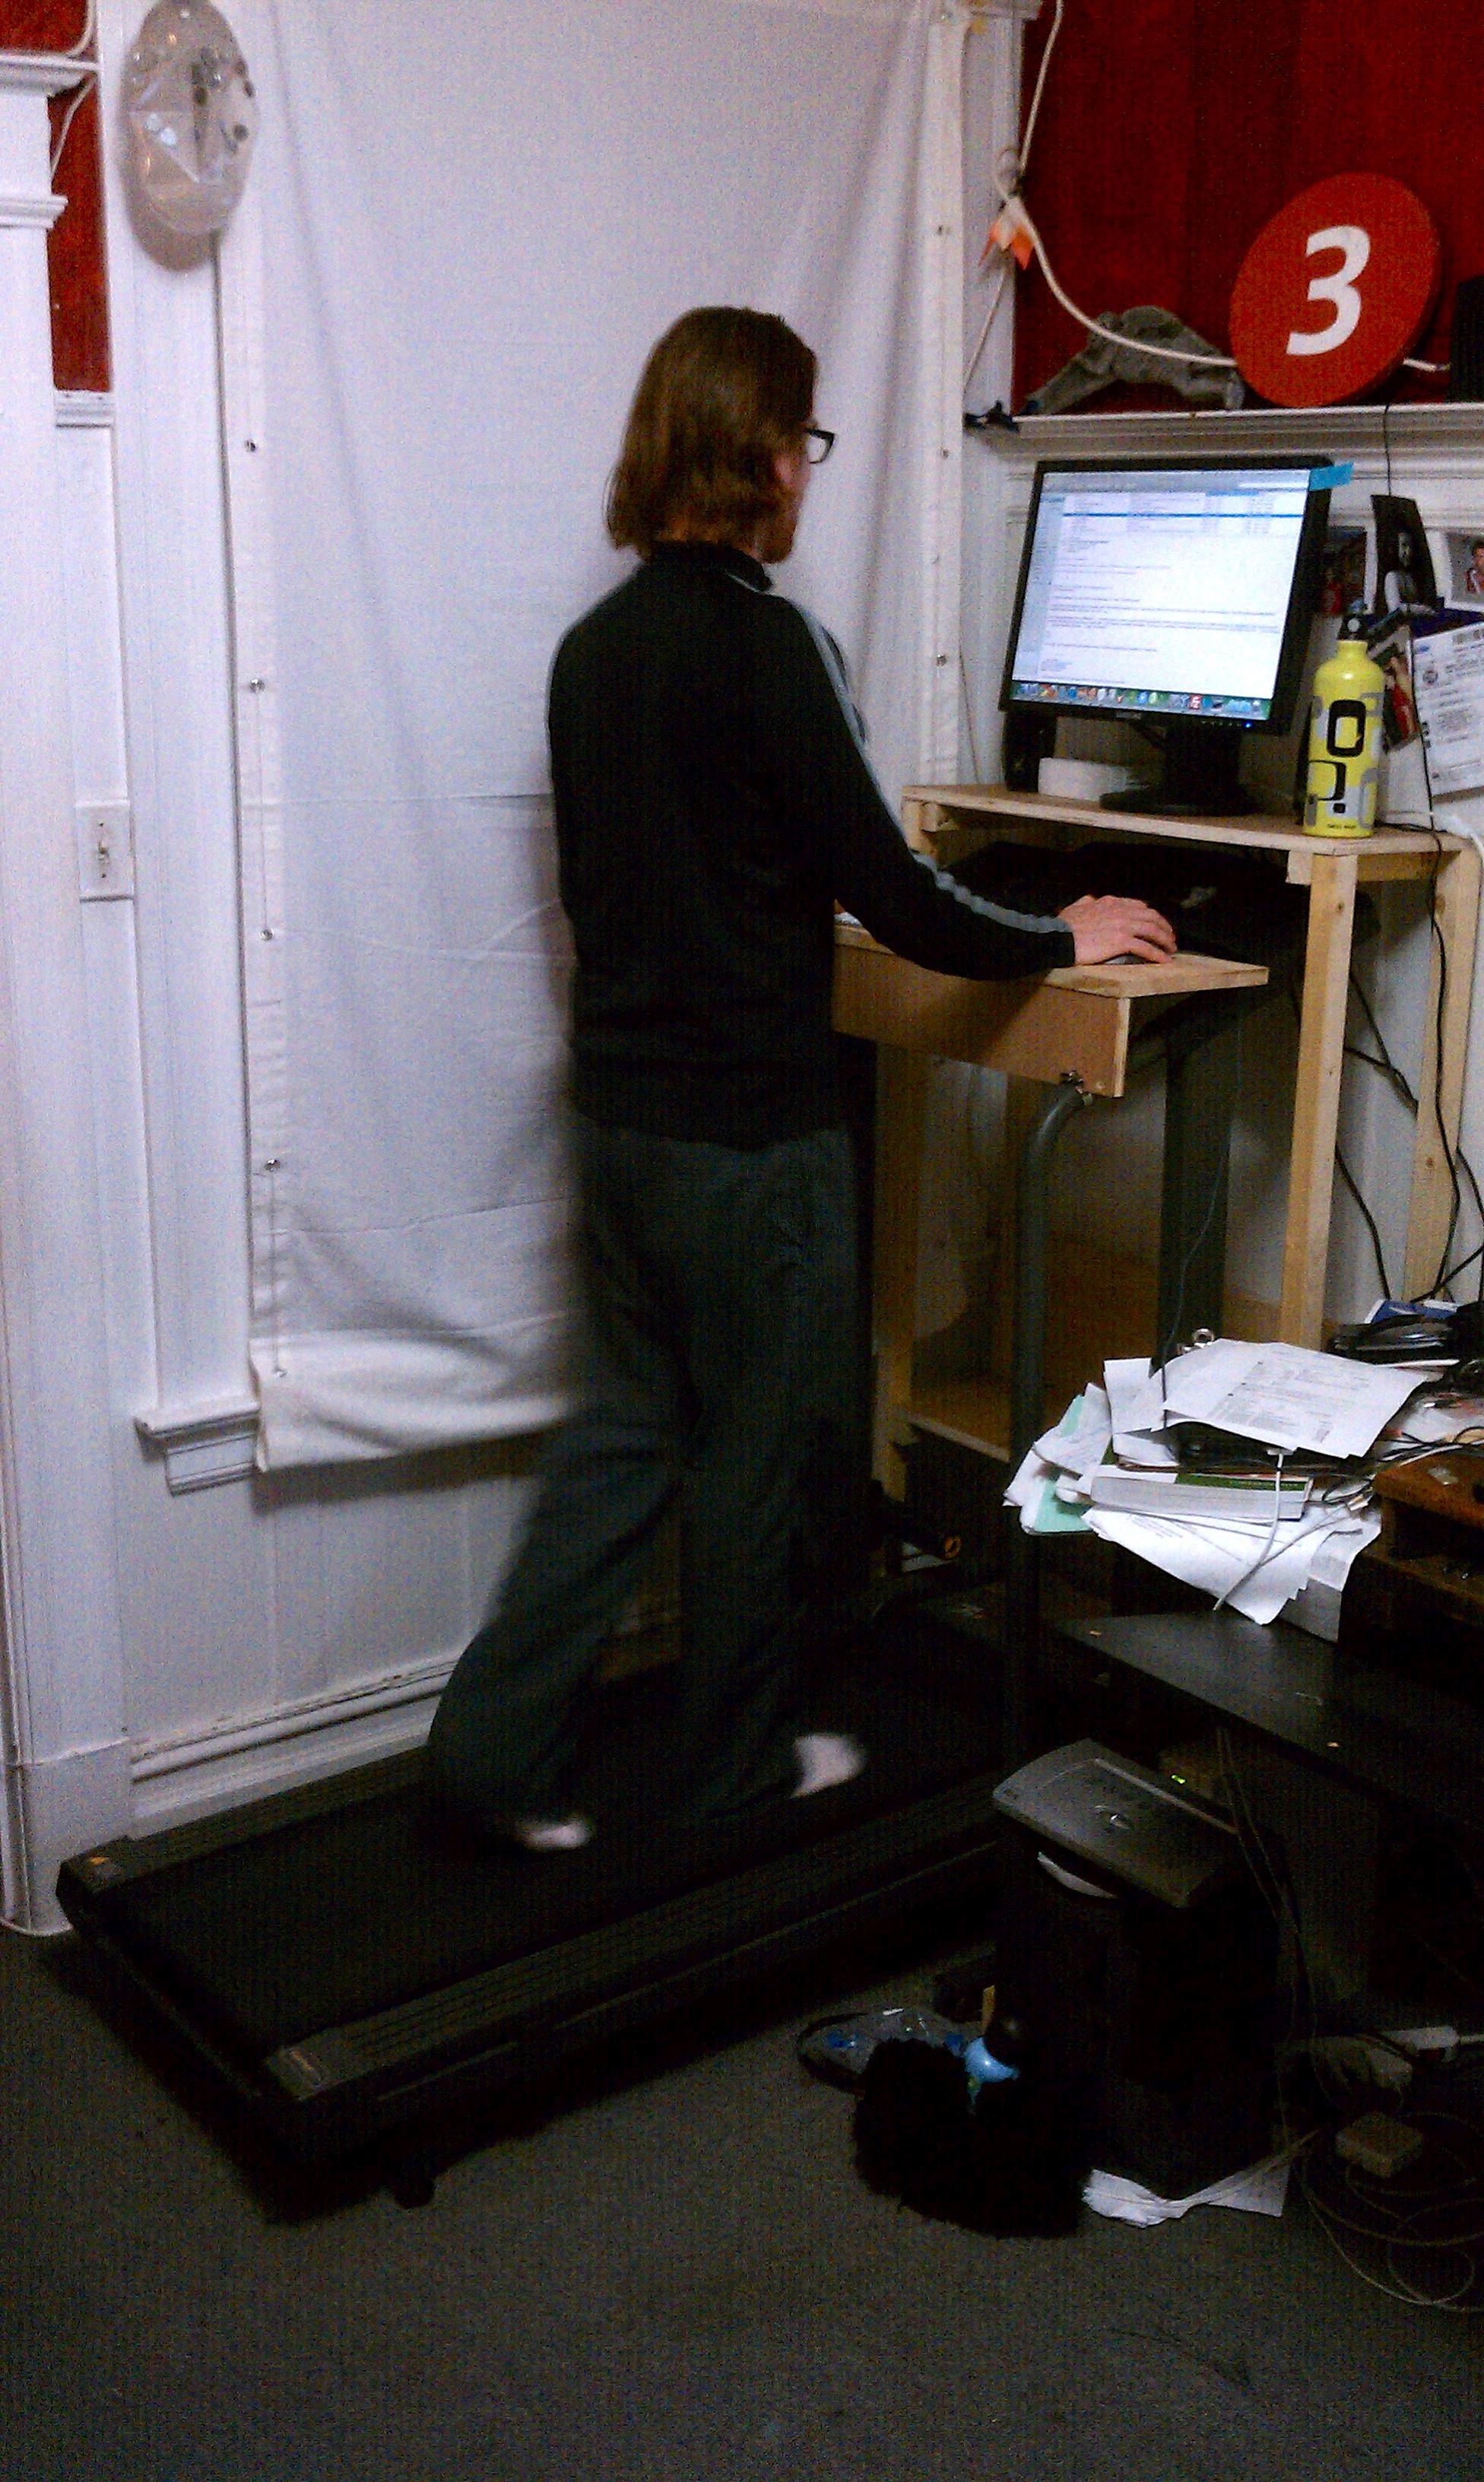 Freestanding collapsible treadmill desk